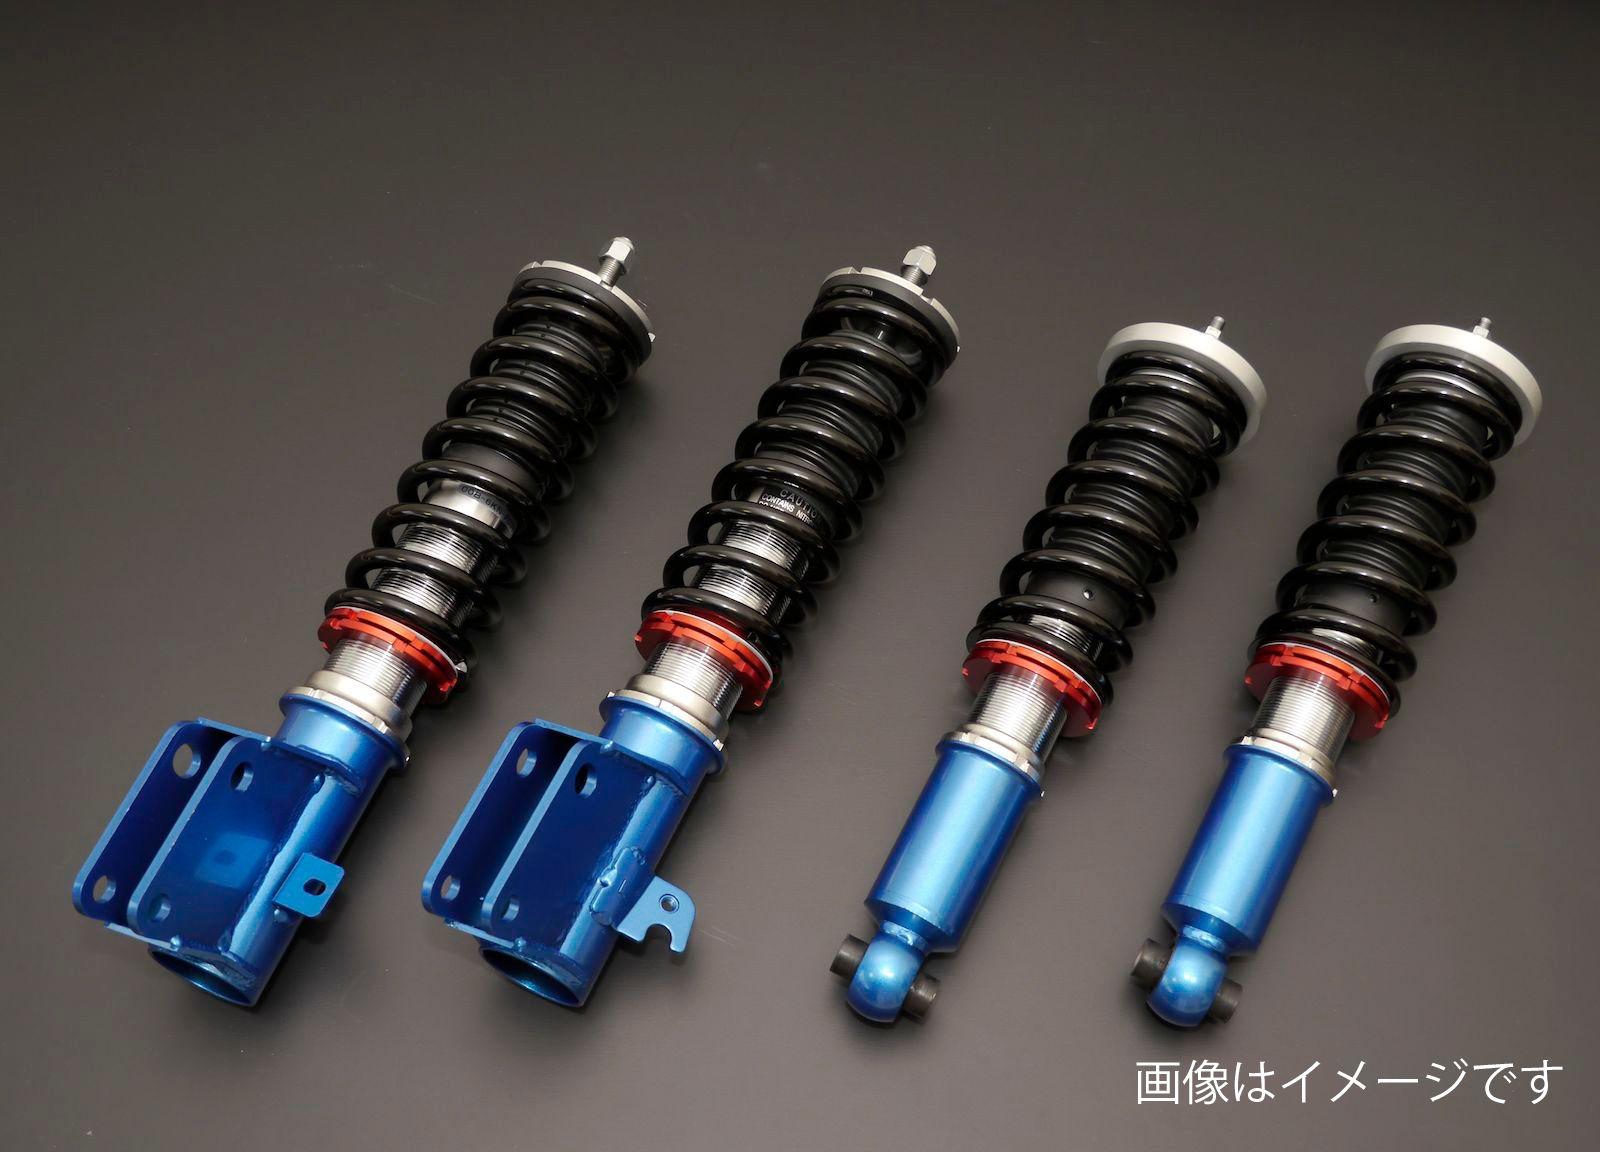 CUSCO(クスコ) 車高調キット street ZERO 日産 スカイライン クロスオーバー J50 2009.7- 商品番号:258 61P CN